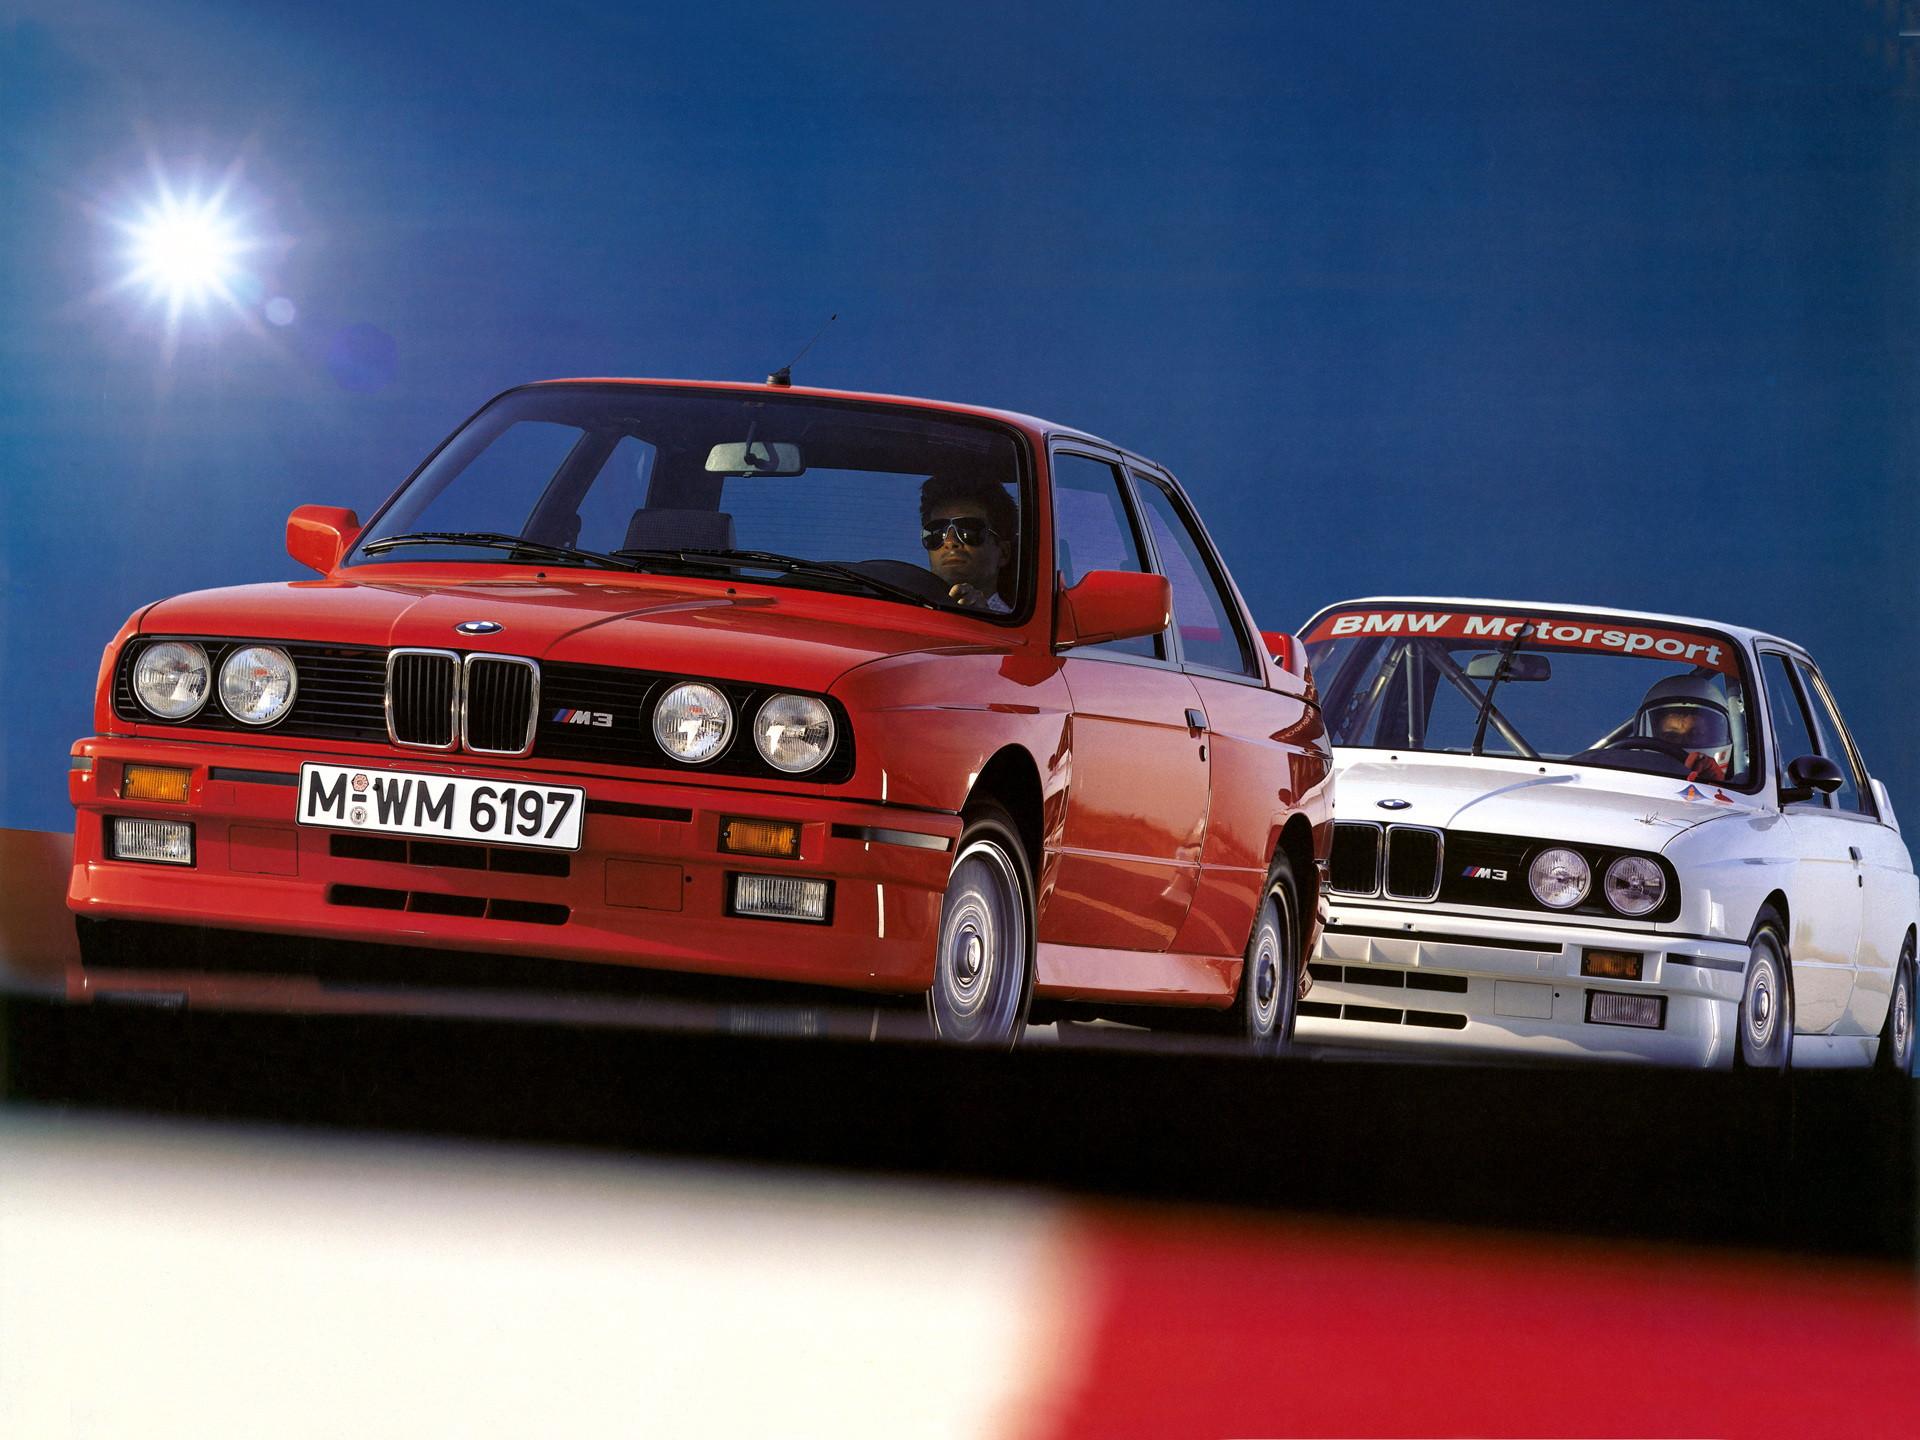 BMW M3 Car wallpapers HD 1920x1440